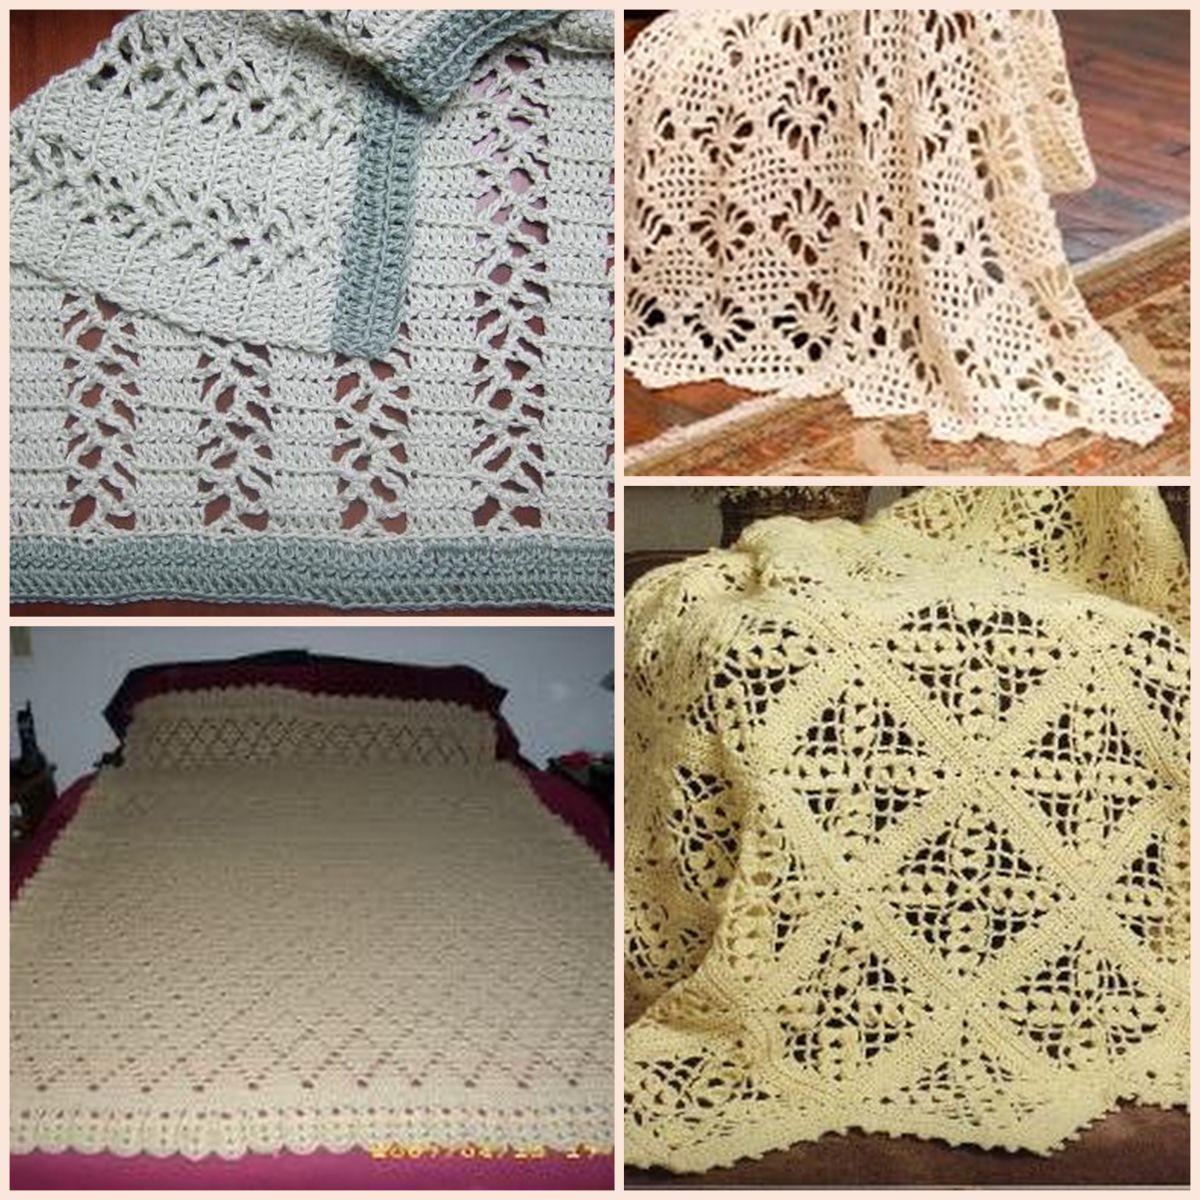 28 lace crochet designs for afghans afghans crochet and crochet 20 lace crochet designs for afghans from allfreecrochetafghanpatterns bankloansurffo Images